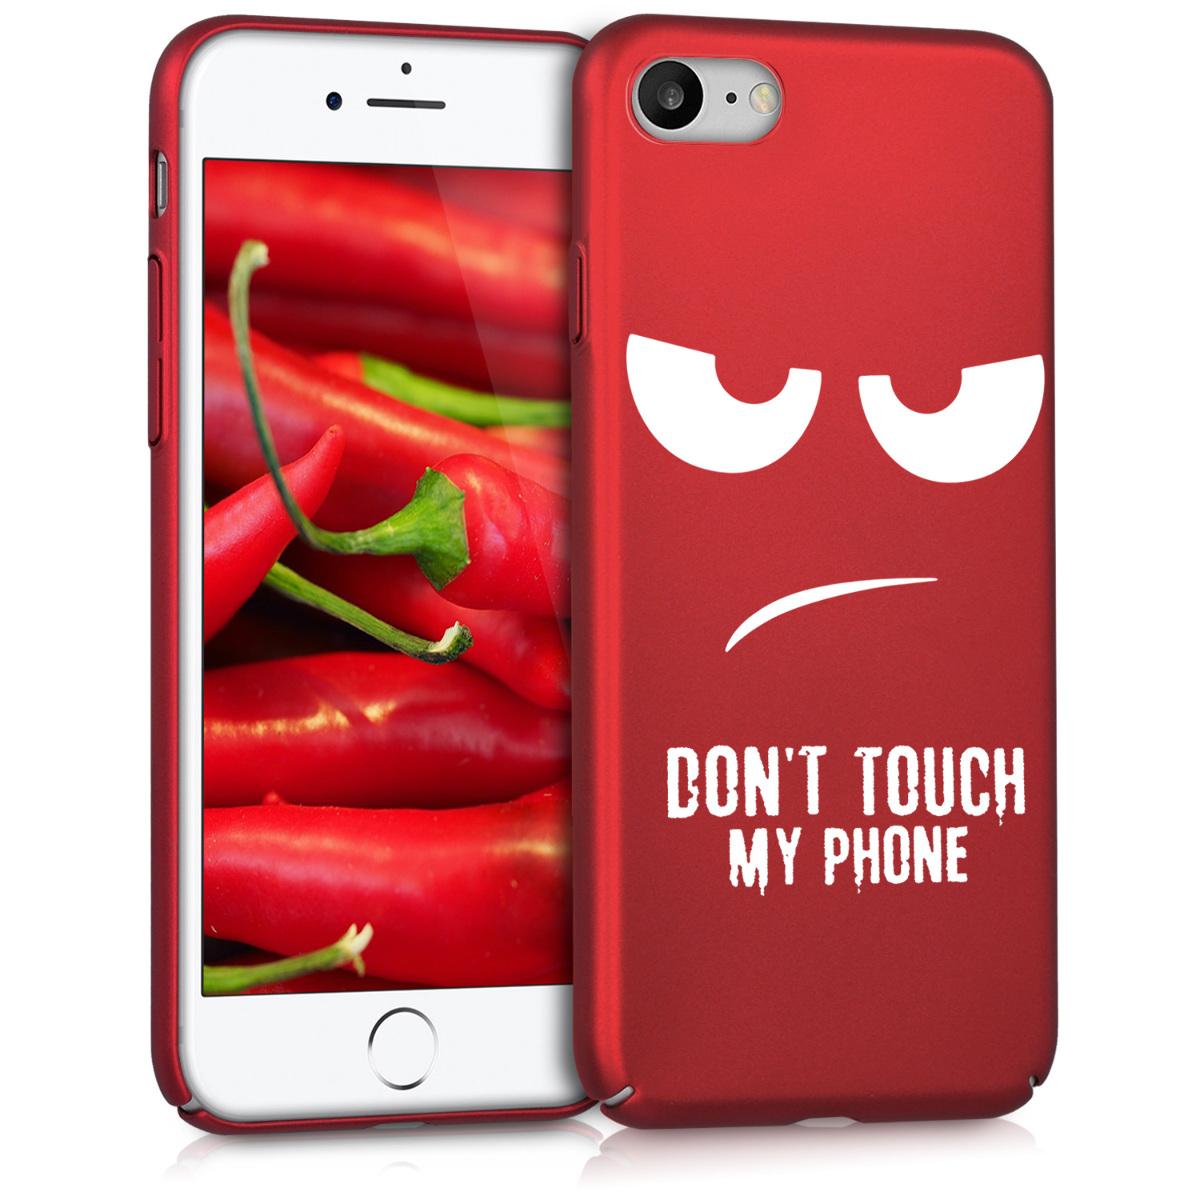 KW Slim Anti-Slip Cover - Σκληρή Θήκη Καουτσούκ iPhone 7 / 8 - Κόκκινο - Don't touch my phone (44139.01)